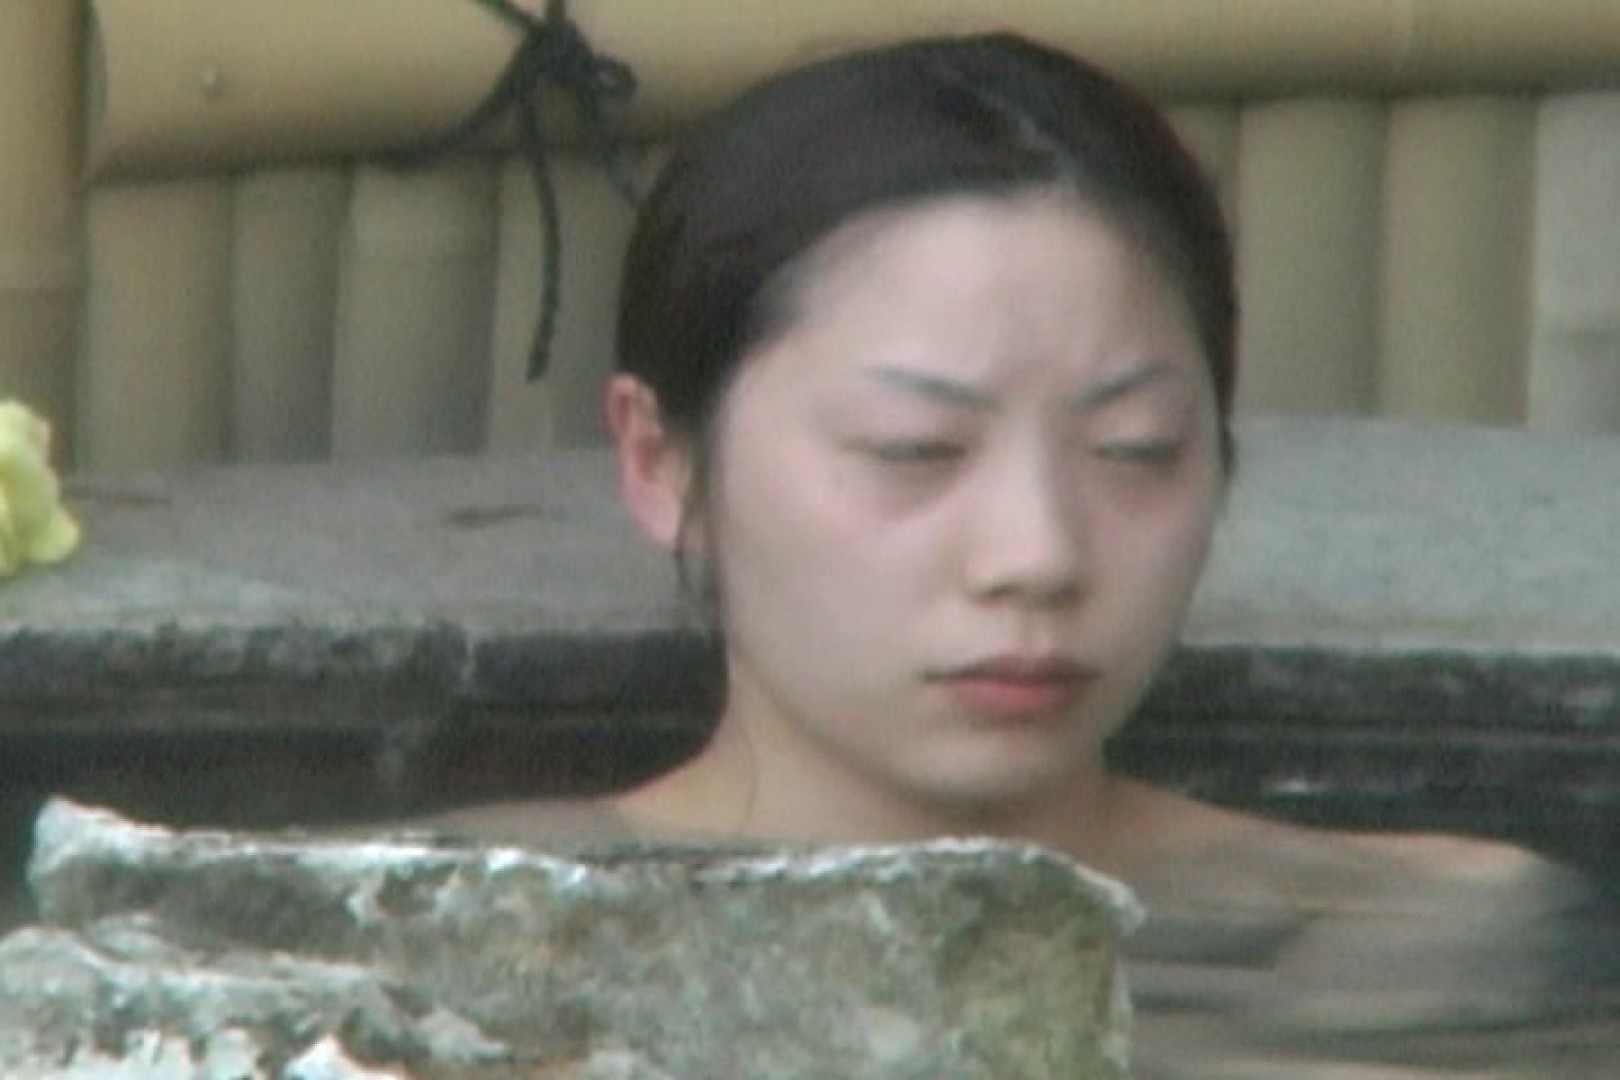 Aquaな露天風呂Vol.596 露天 覗きおまんこ画像 77画像 11